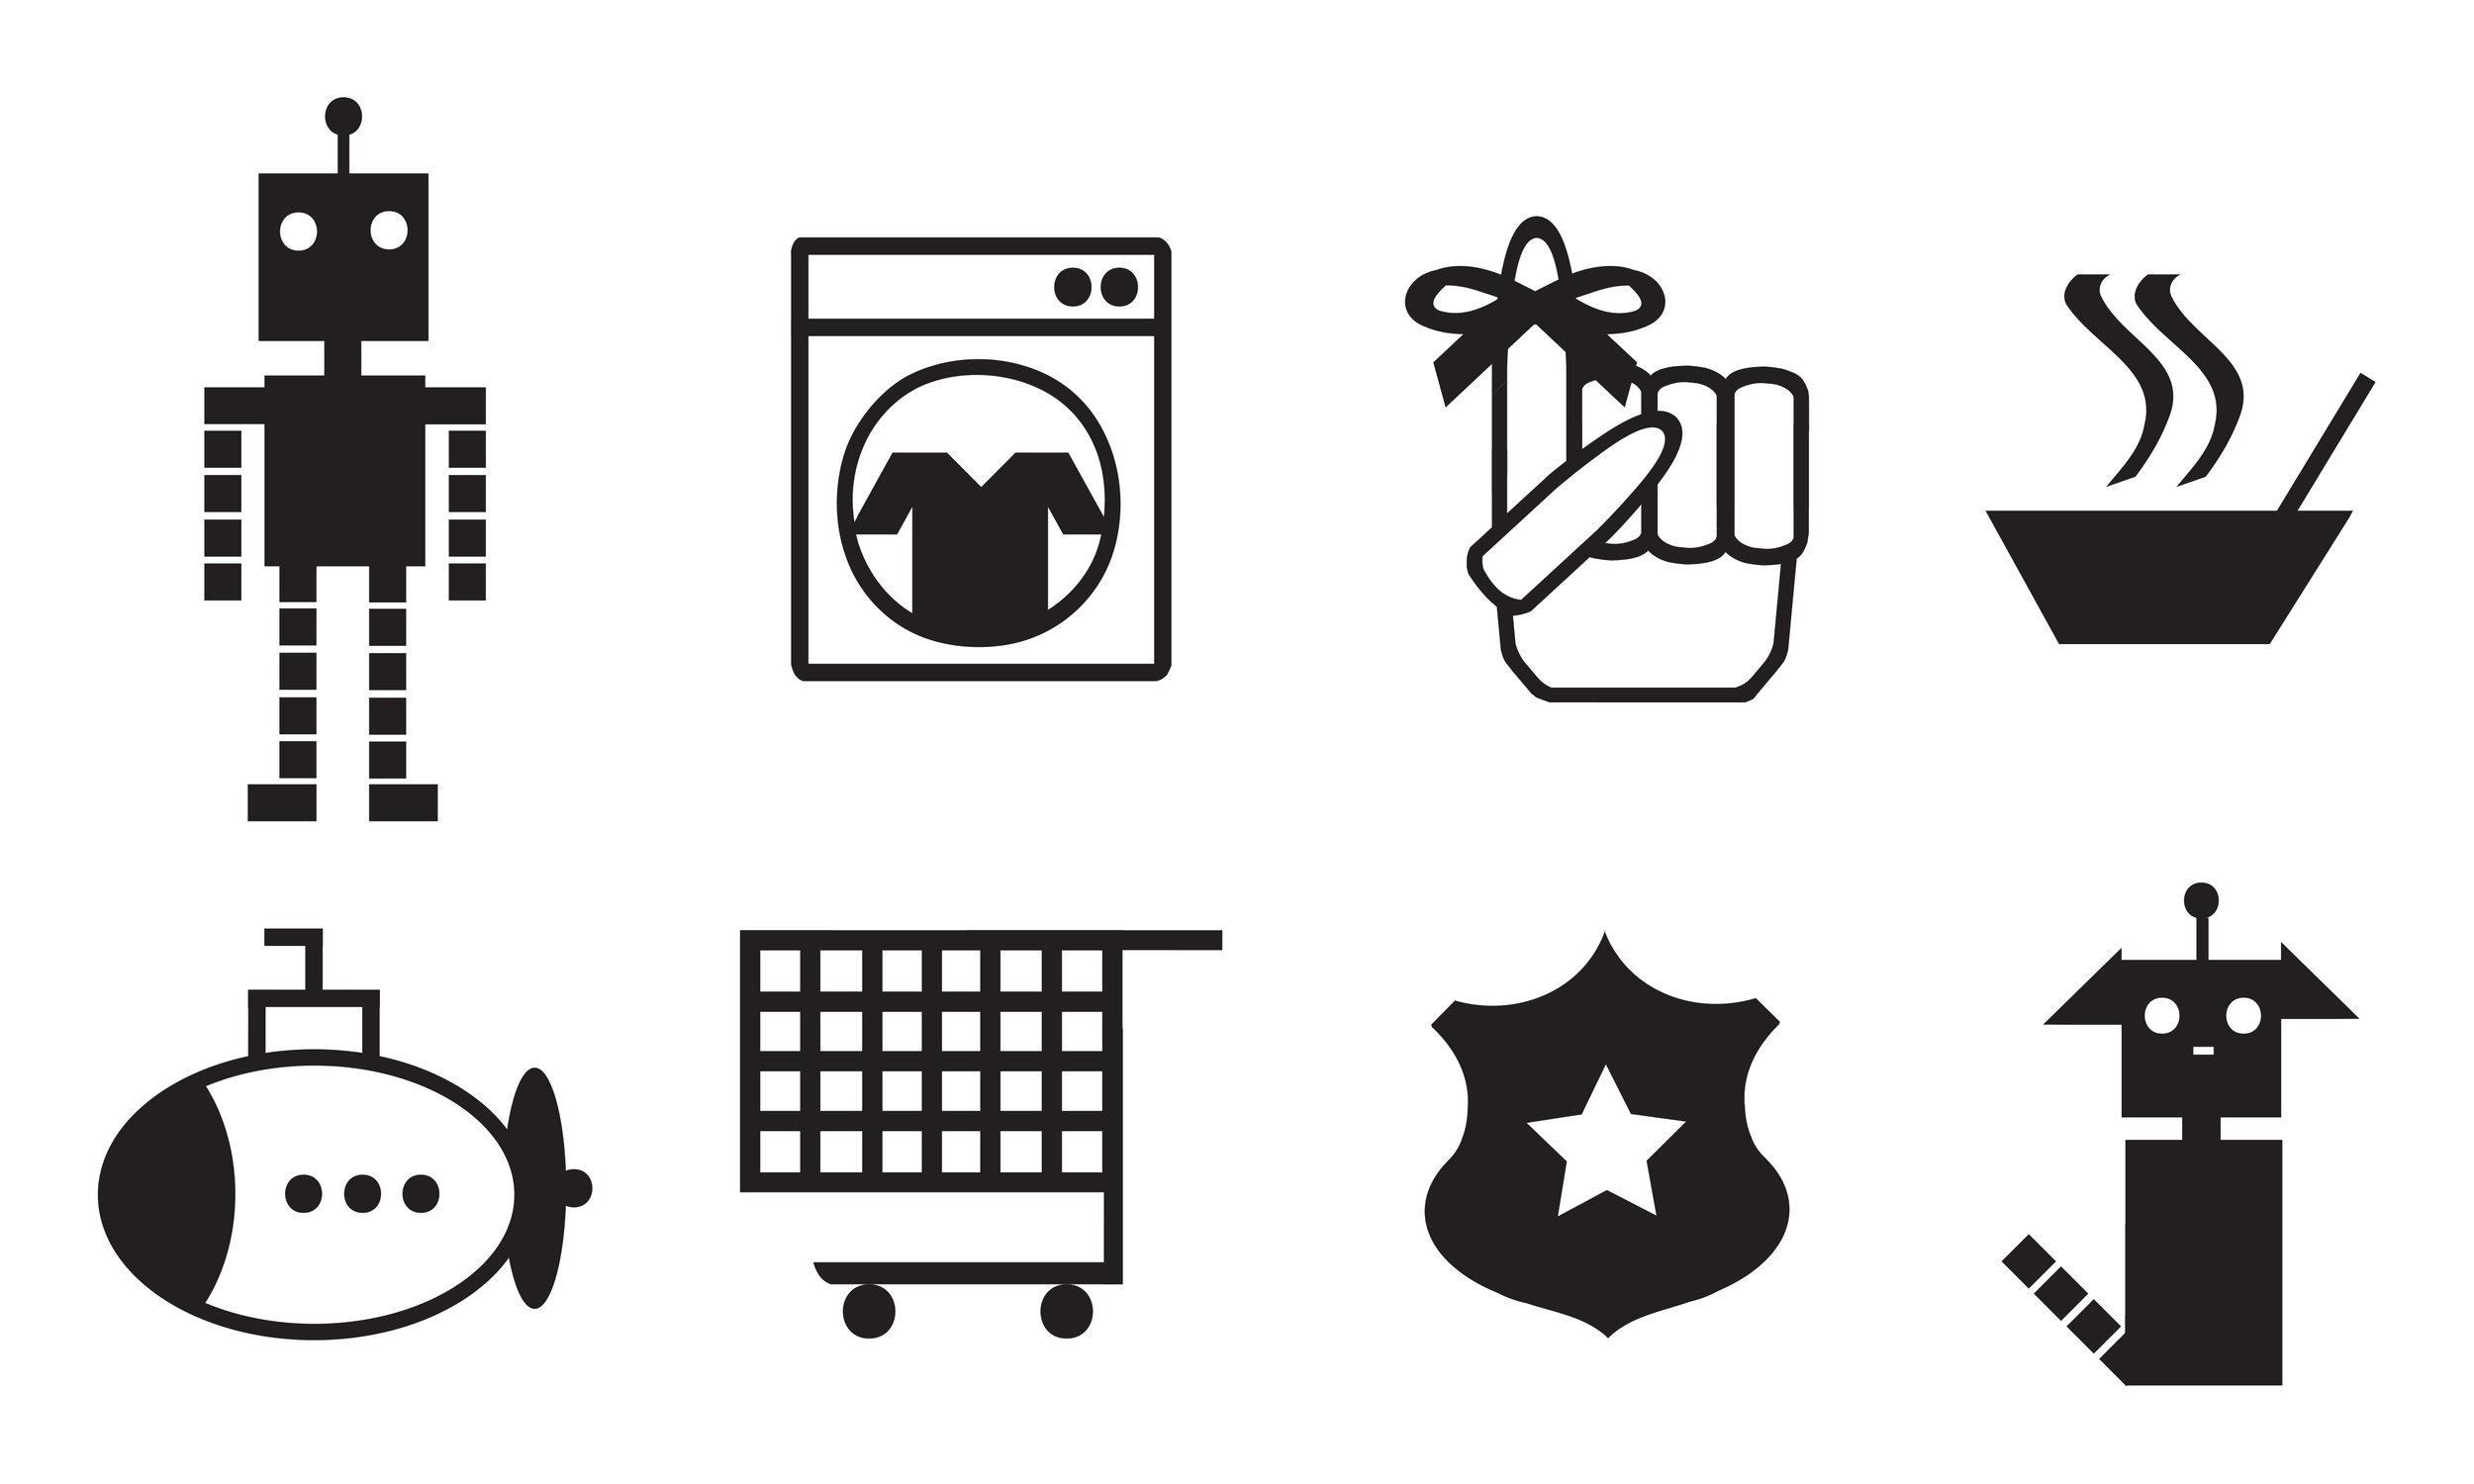 Revised Icon Set